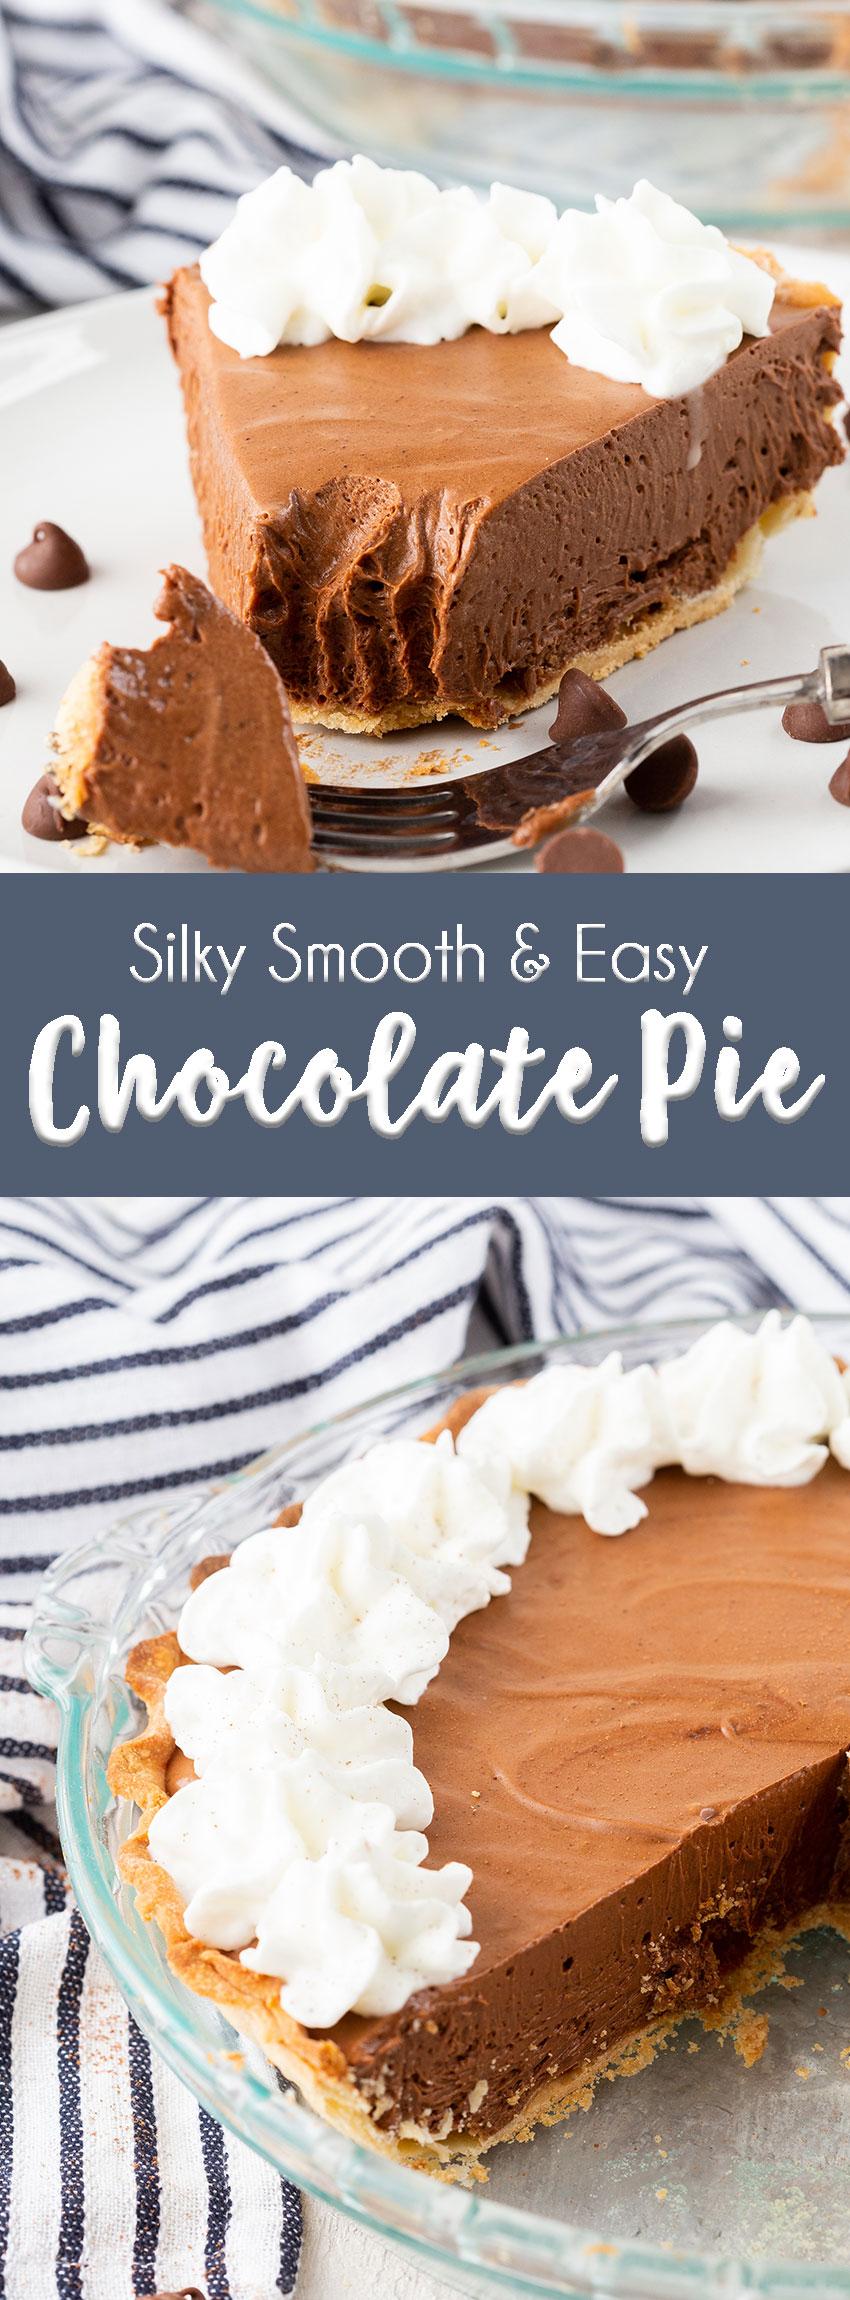 Chocolate Pie- a silky smooth and creamy chocolate pie